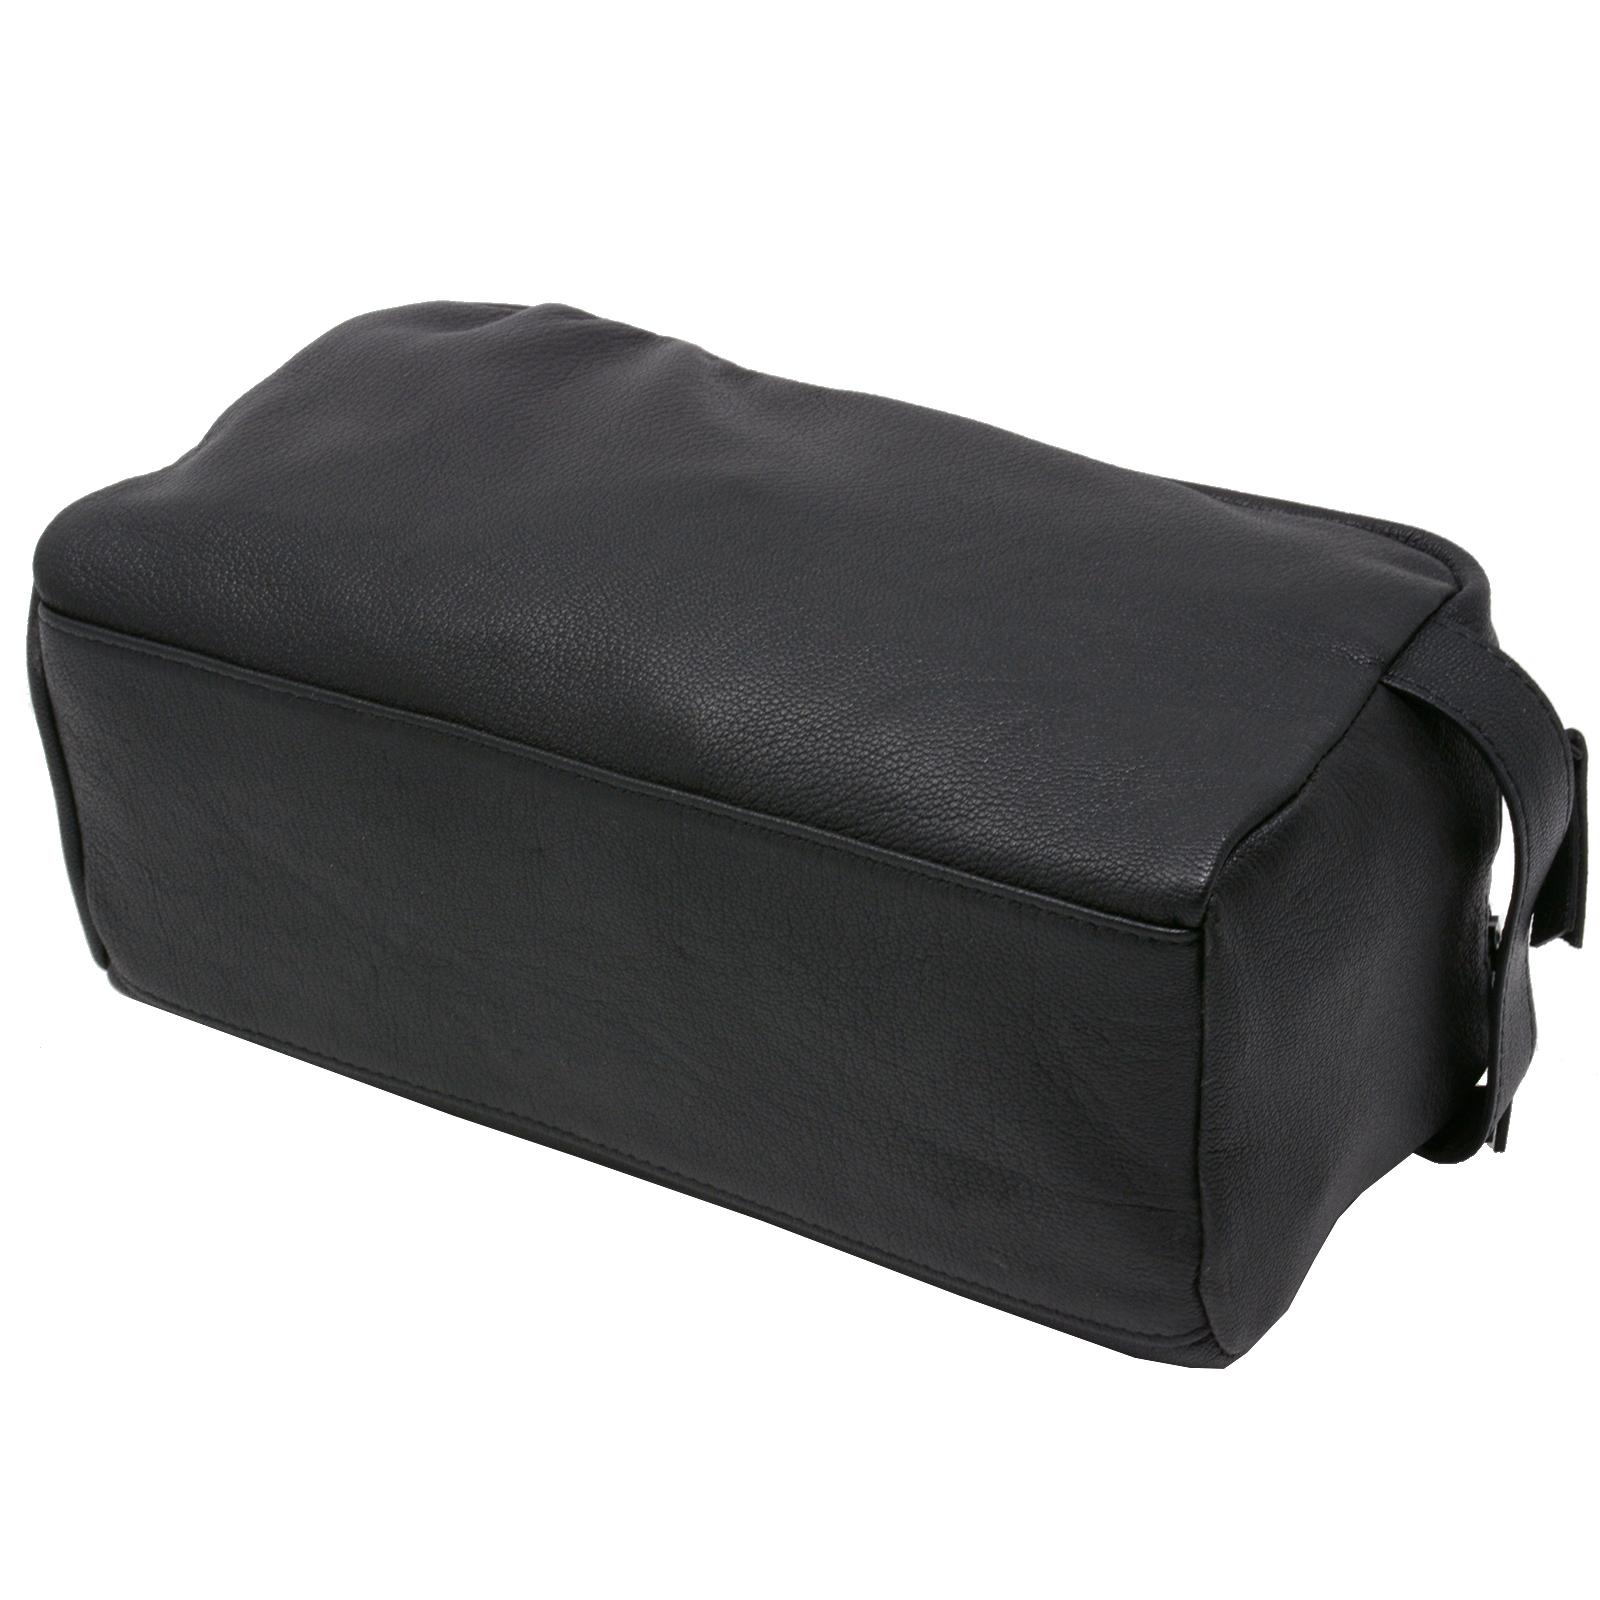 AlpineSwiss-Sedona-Toiletry-Bag-Genuine-Leather-Shaving-Kit-Dopp-Kit-Travel-Case thumbnail 18